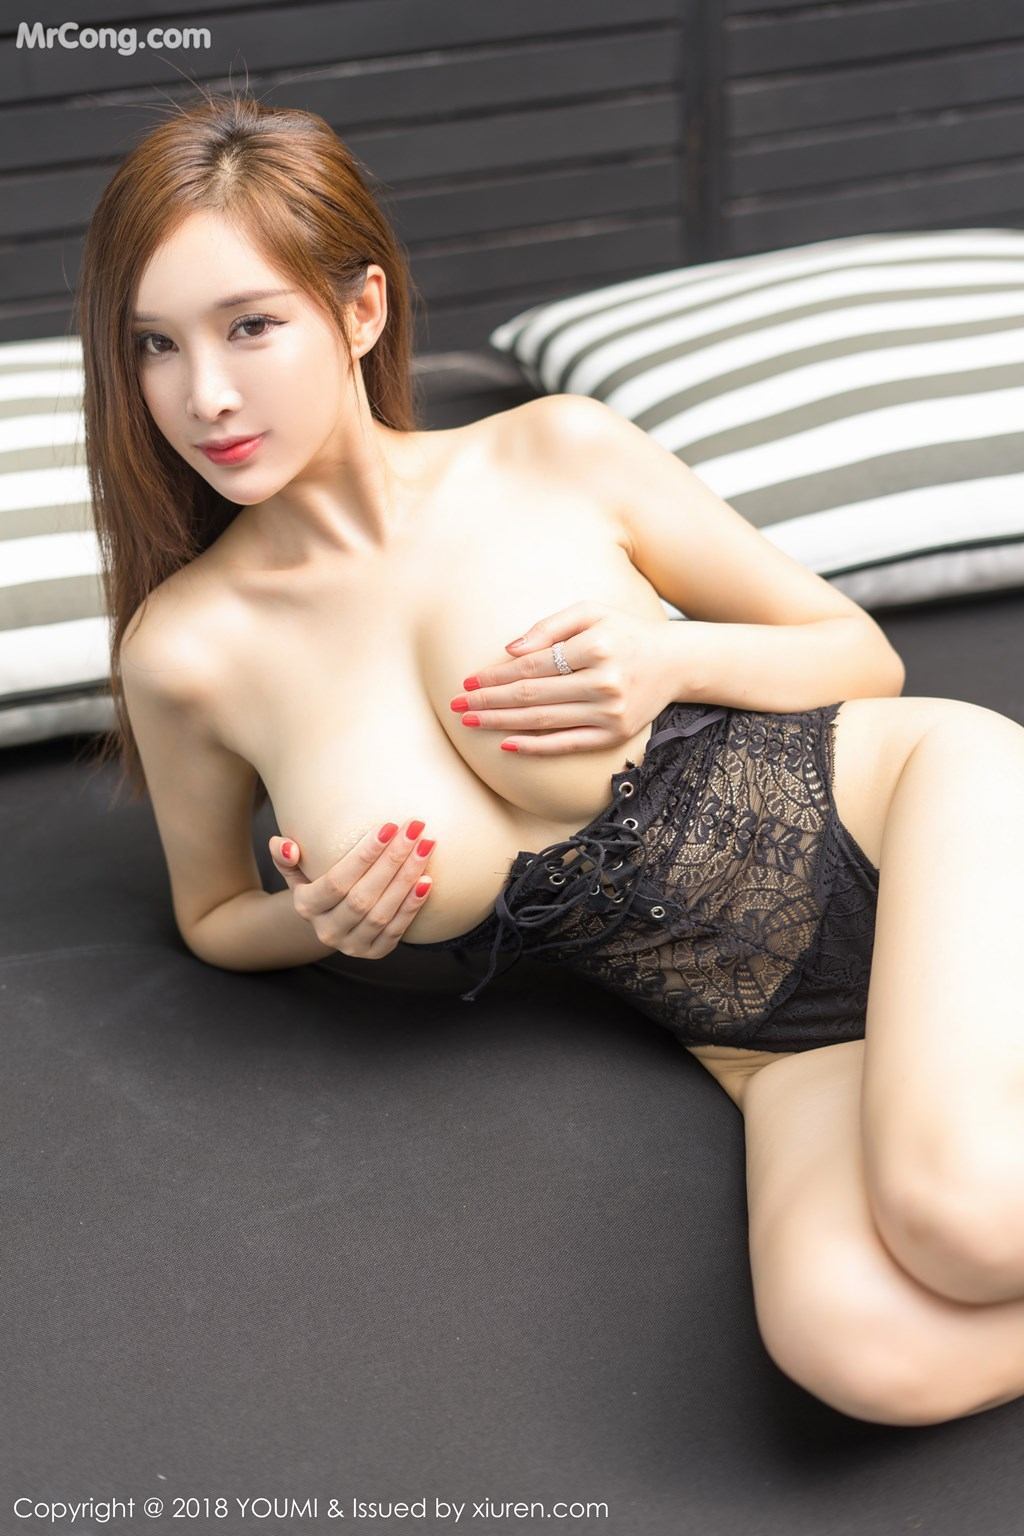 Image YouMi-Vol.213-Tu-Fei-Yuan-Ai-Cuo-Qiong-MrCong.com-006 in post YouMi Vol.213: Người mẫu 奶瓶土肥圆 (50 ảnh)